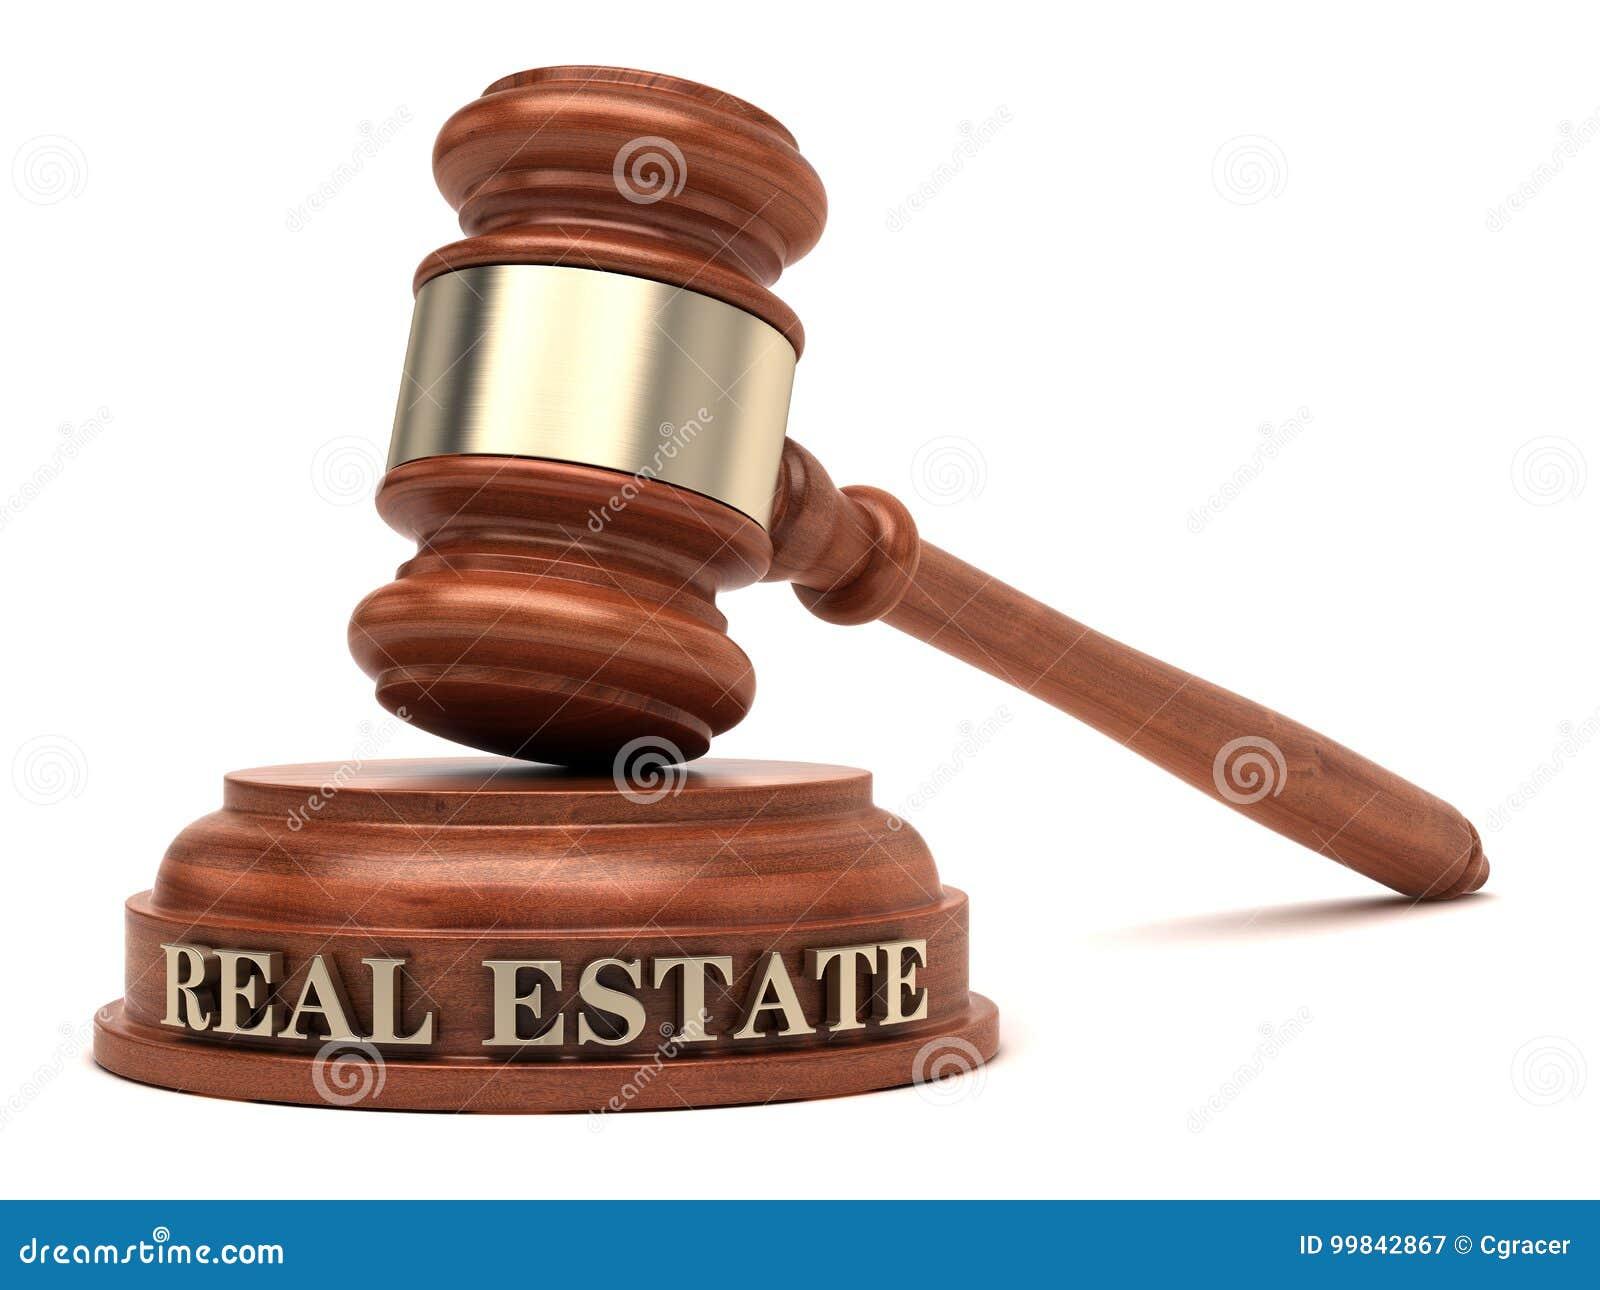 Real estate law stock image  Image of auction, legislation - 99842867